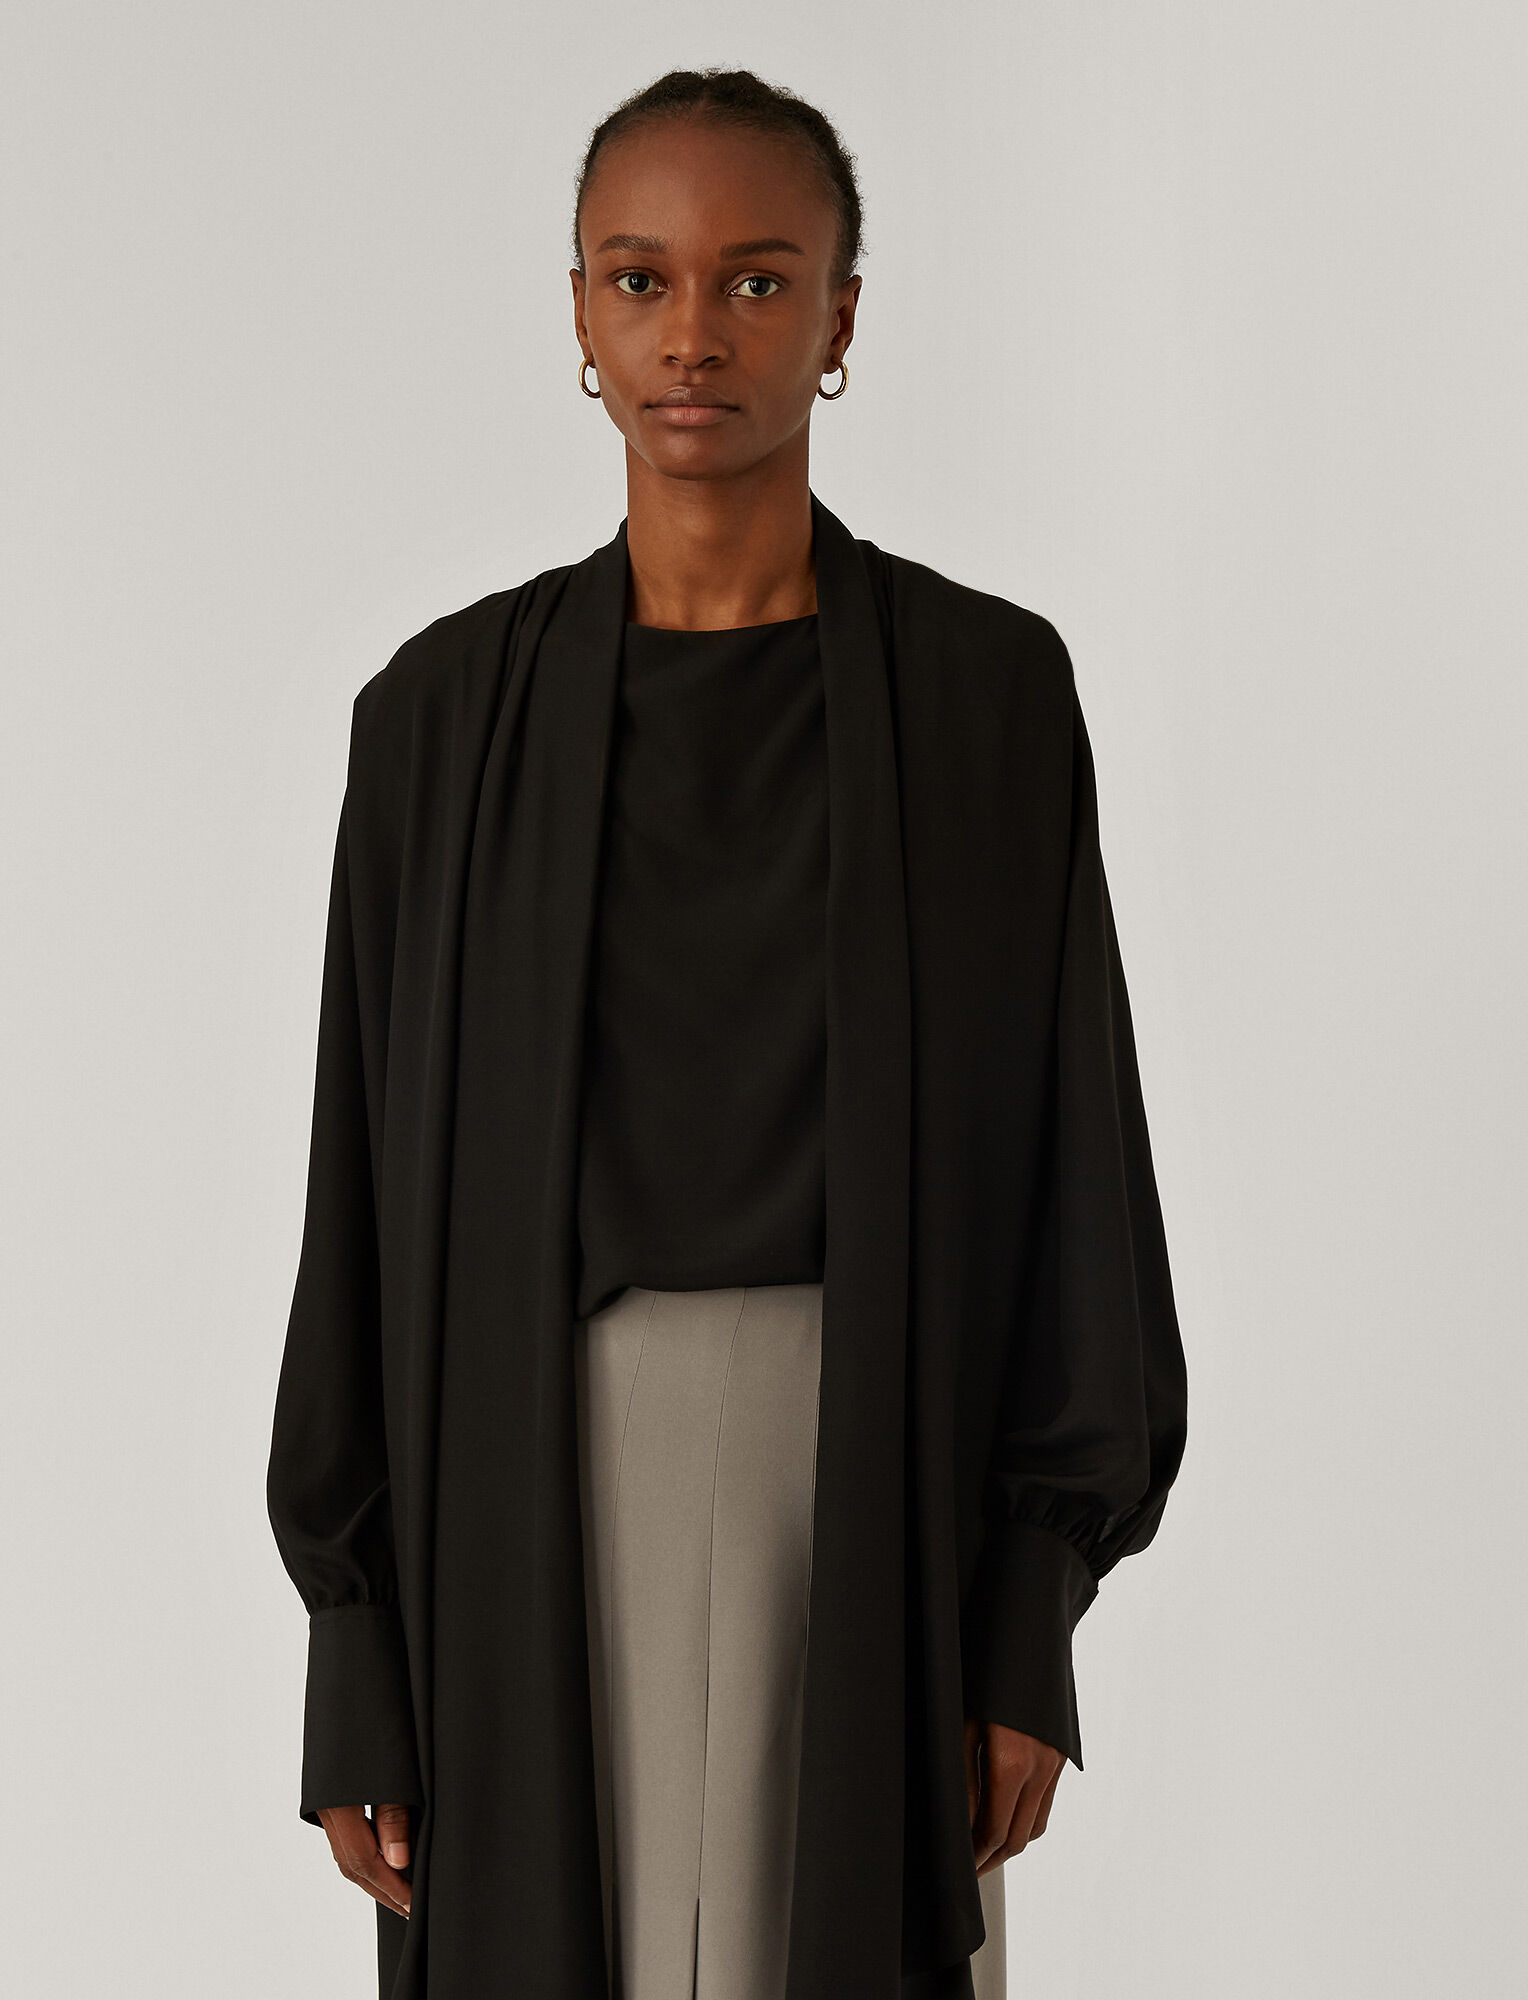 Joseph, Bose Light Silk Blouse, in Black